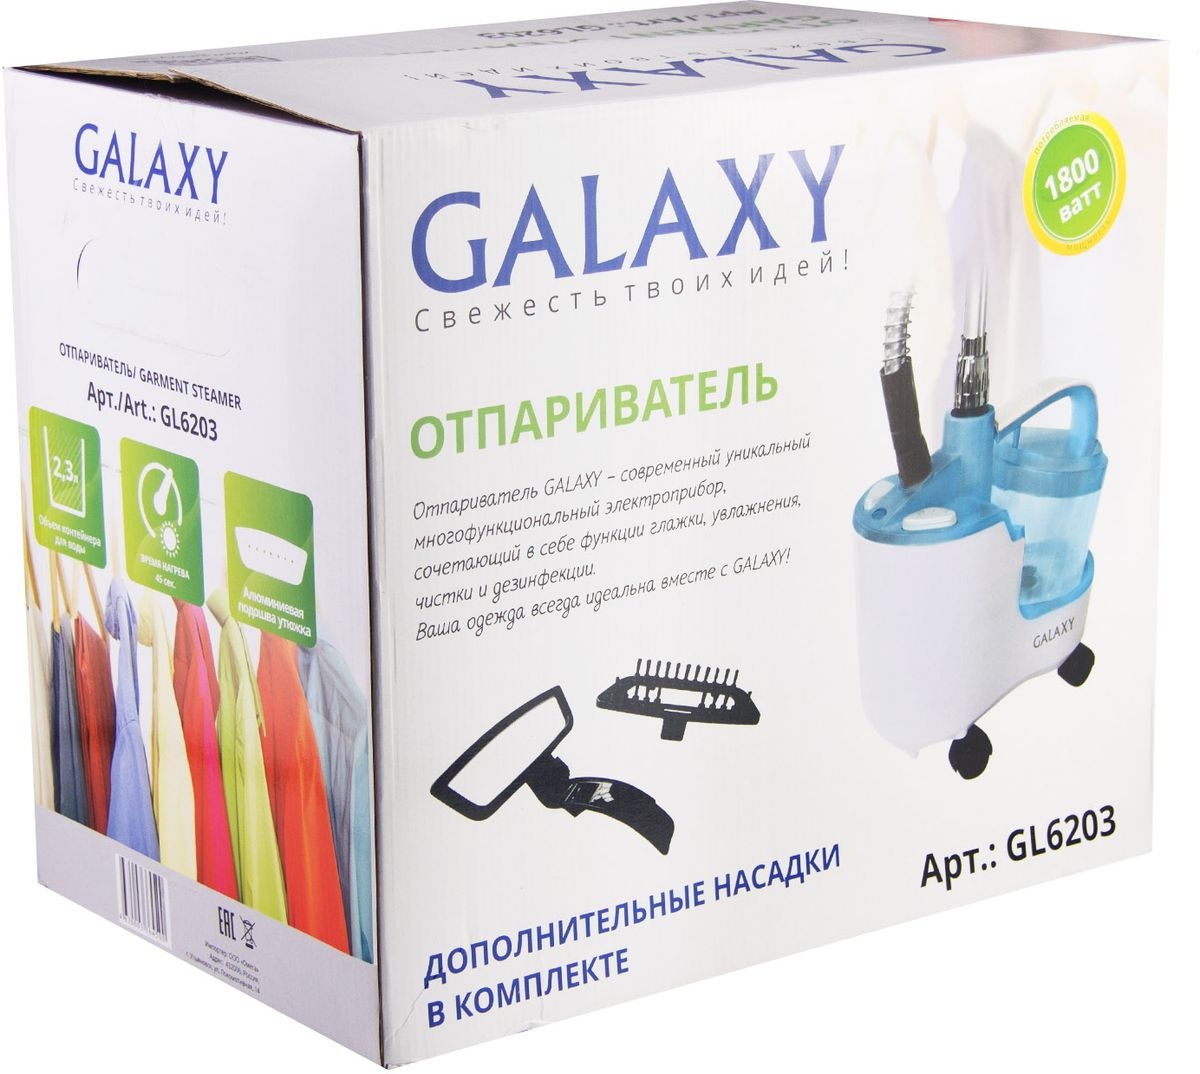 Отпариватель Galaxy GL 6203 Galaxy